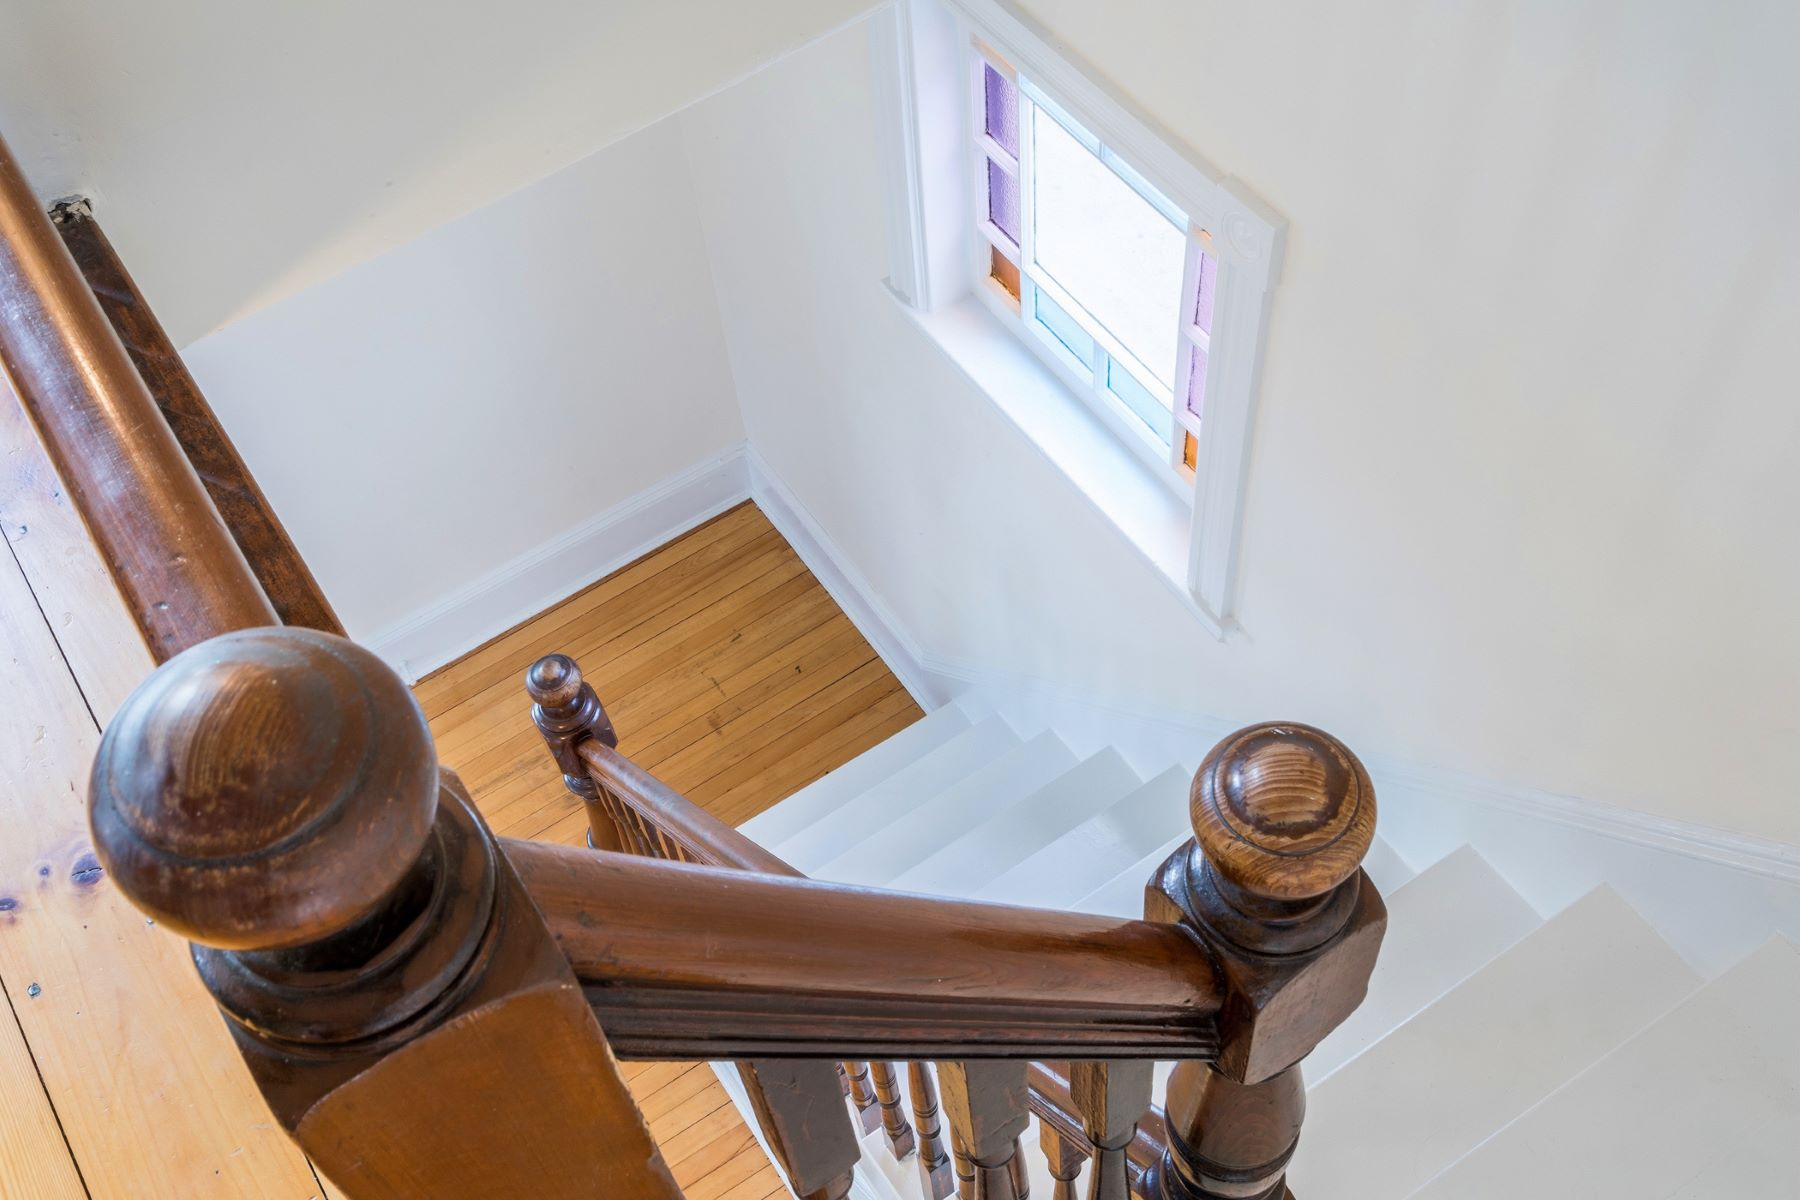 Additional photo for property listing at 38 Berwick Street 38 Berwick Street Portland, Maine 04103 United States